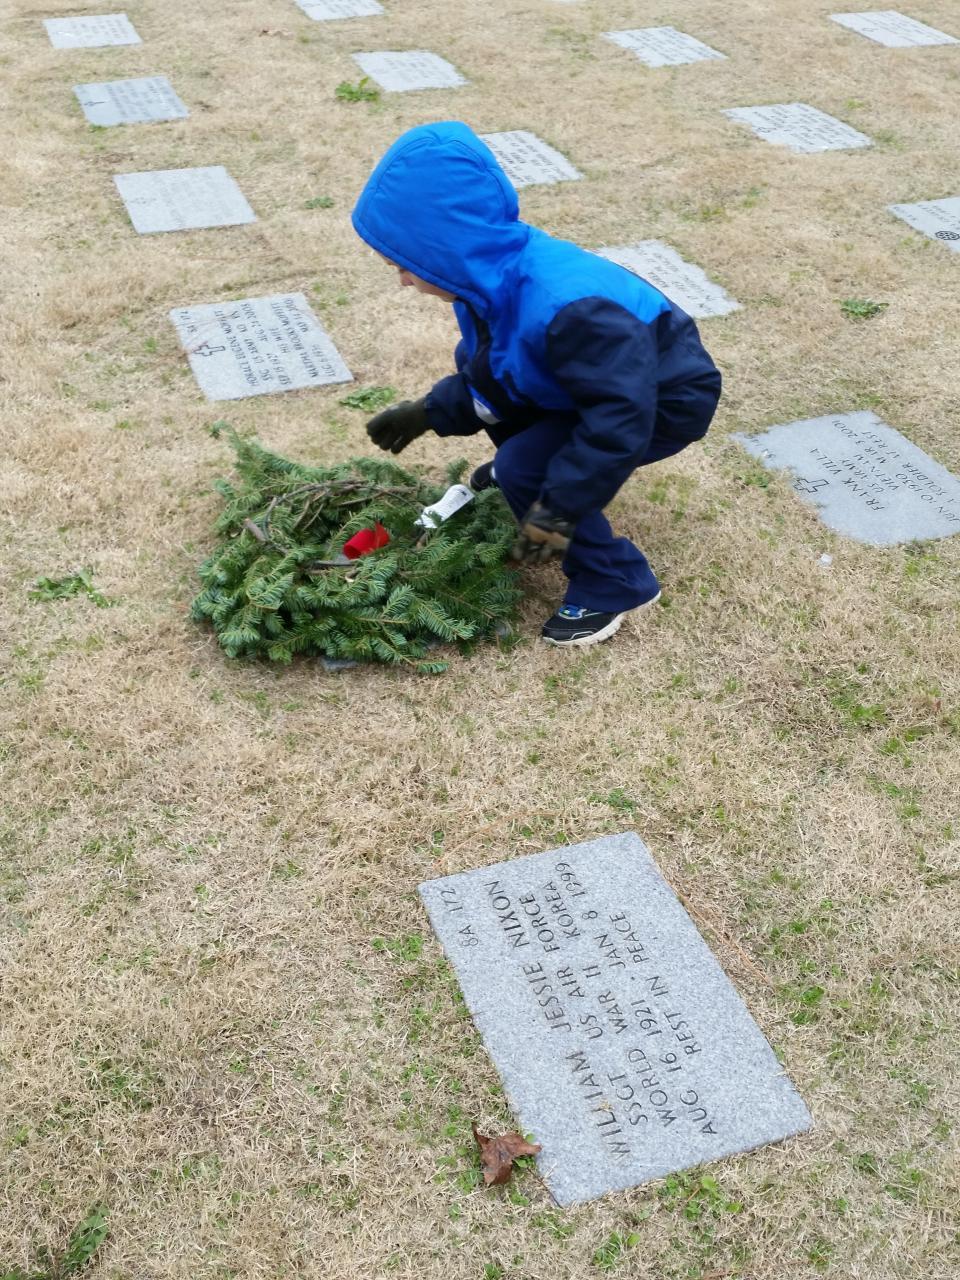 Remebering those fallen